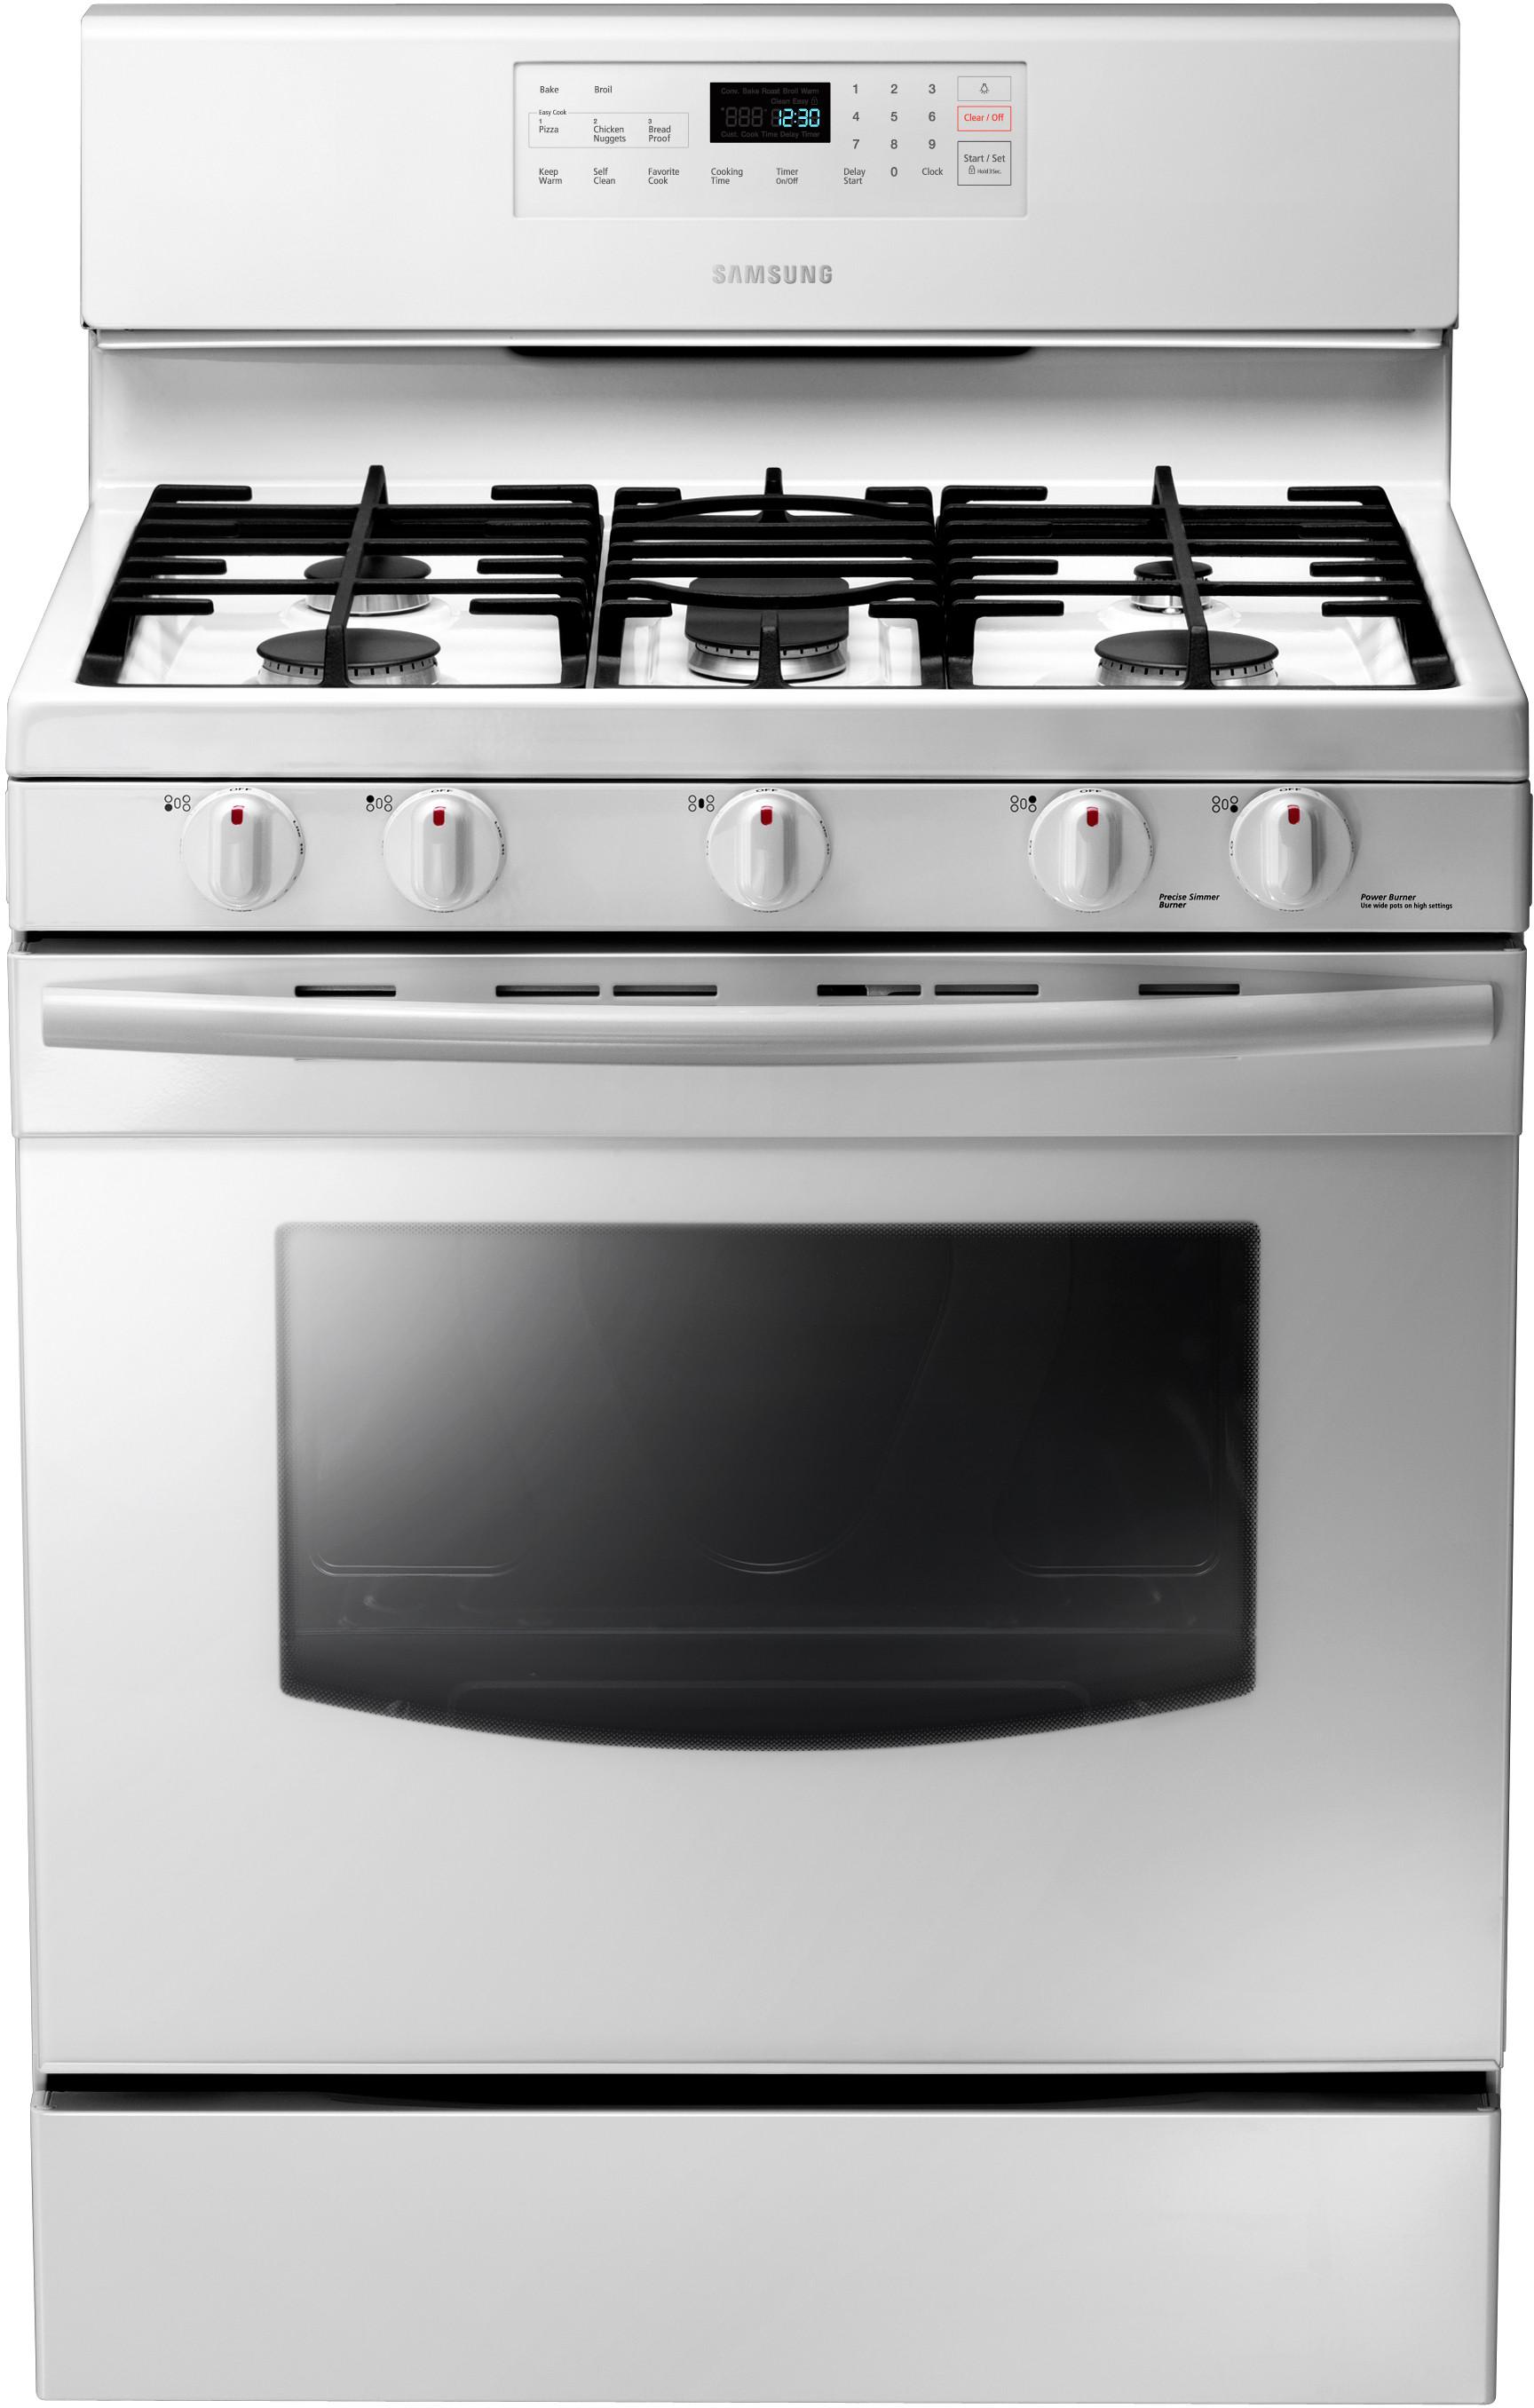 Ge profile 5 burner gas range - Ge Profile 5 Burner Gas Range 50